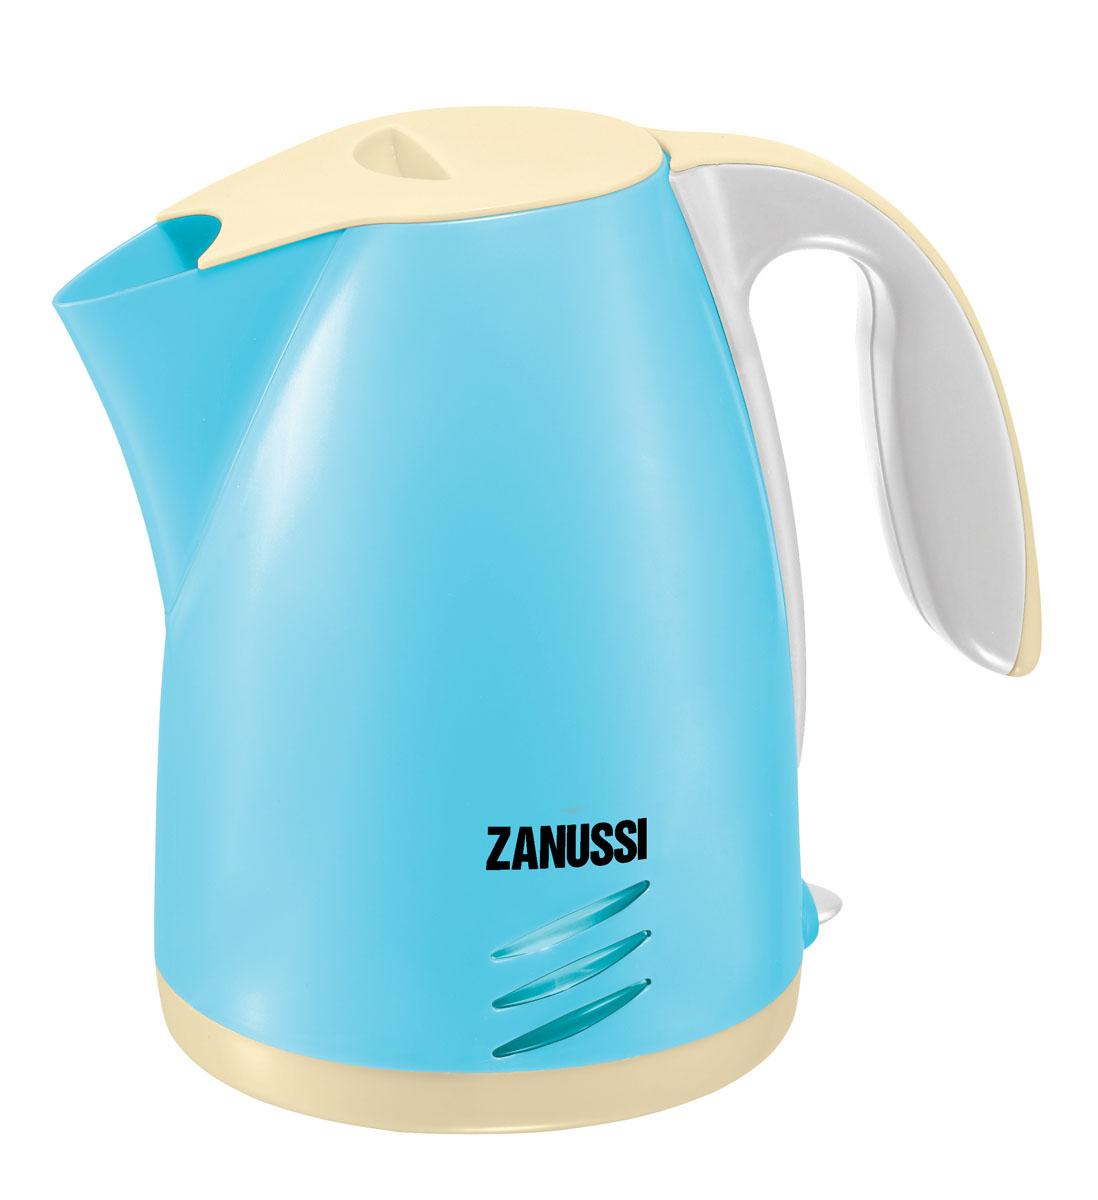 HTI Чайник Zanussi, цвет: голубой, белый, персиковый 1680851.00